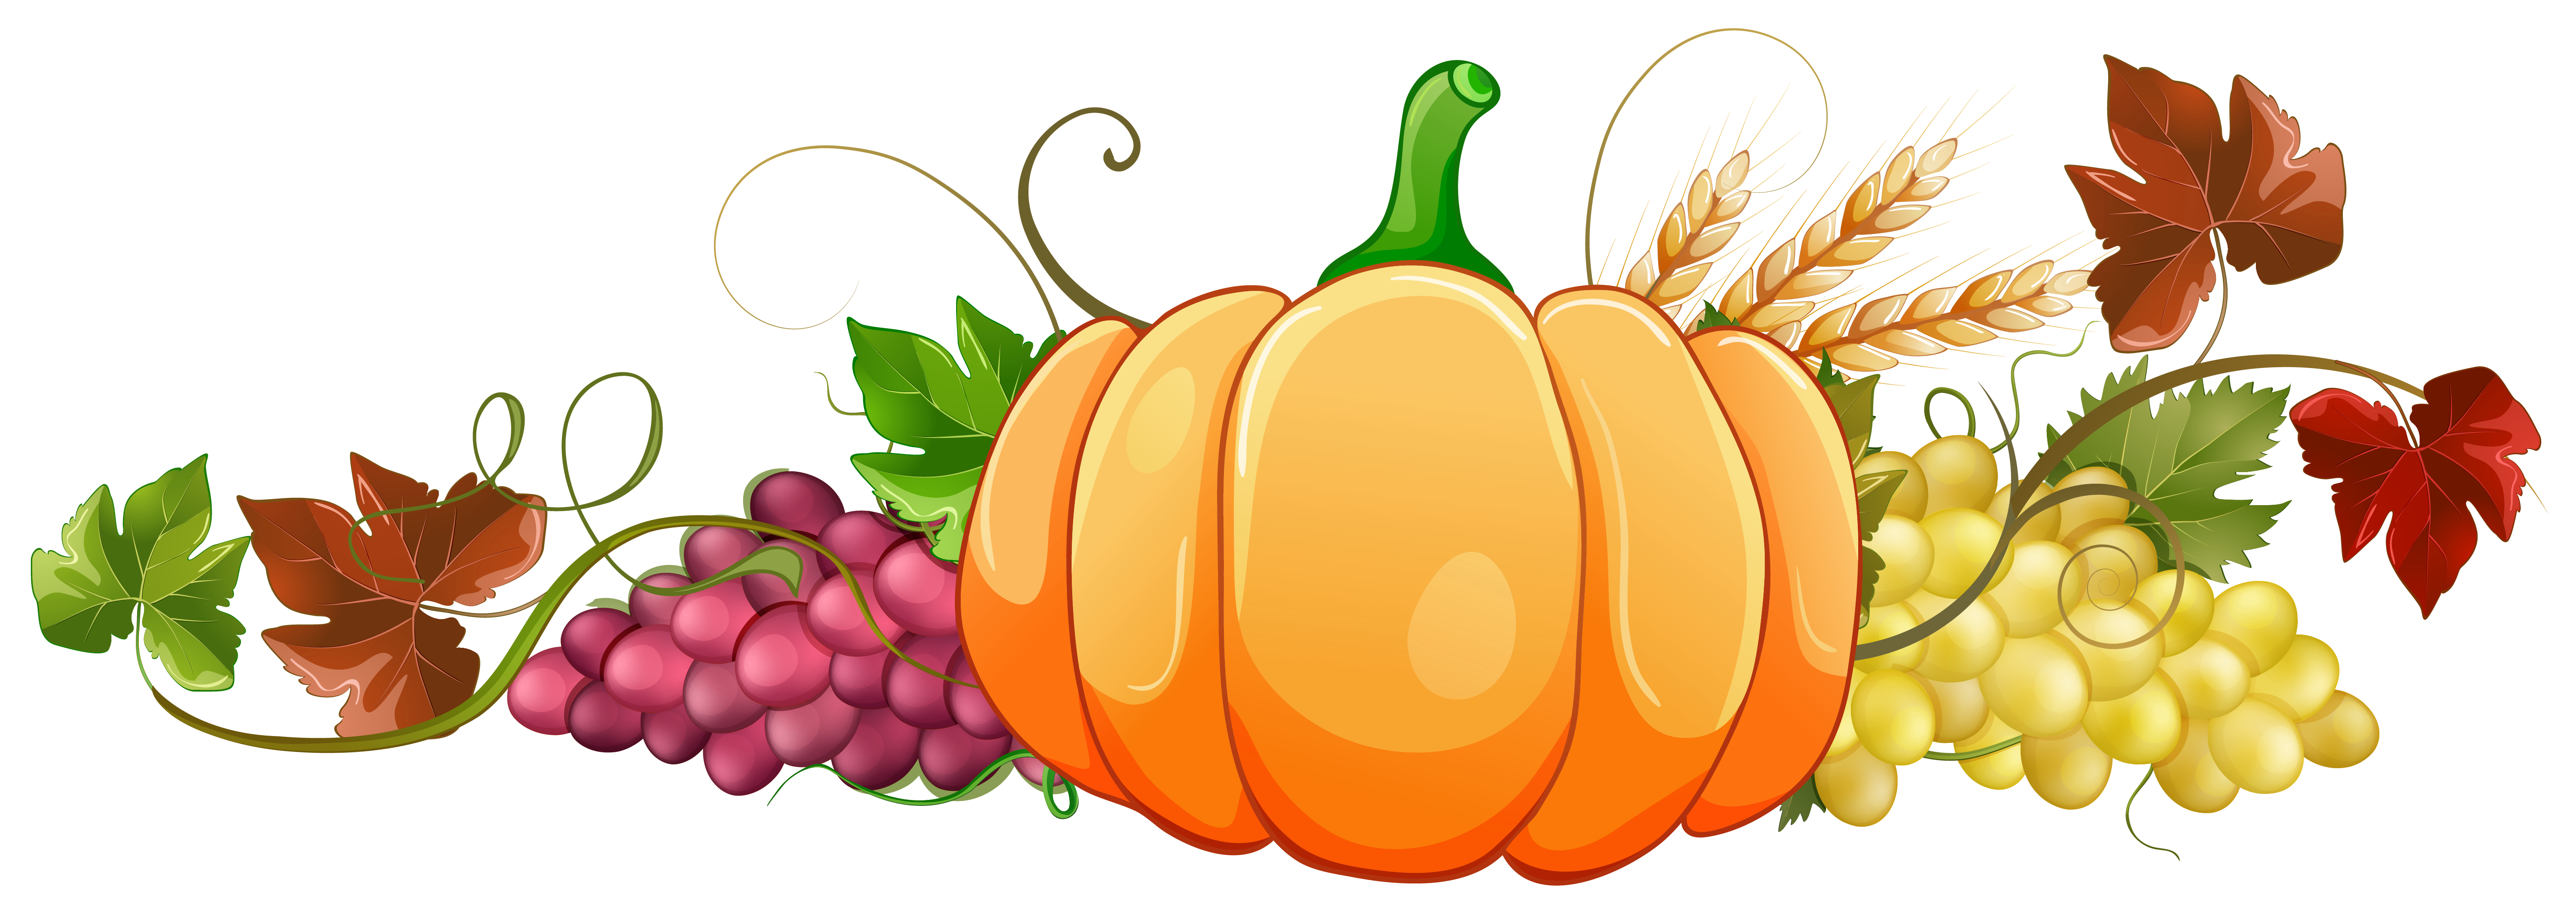 Pumpkin decor png image. Clipart sun autumn